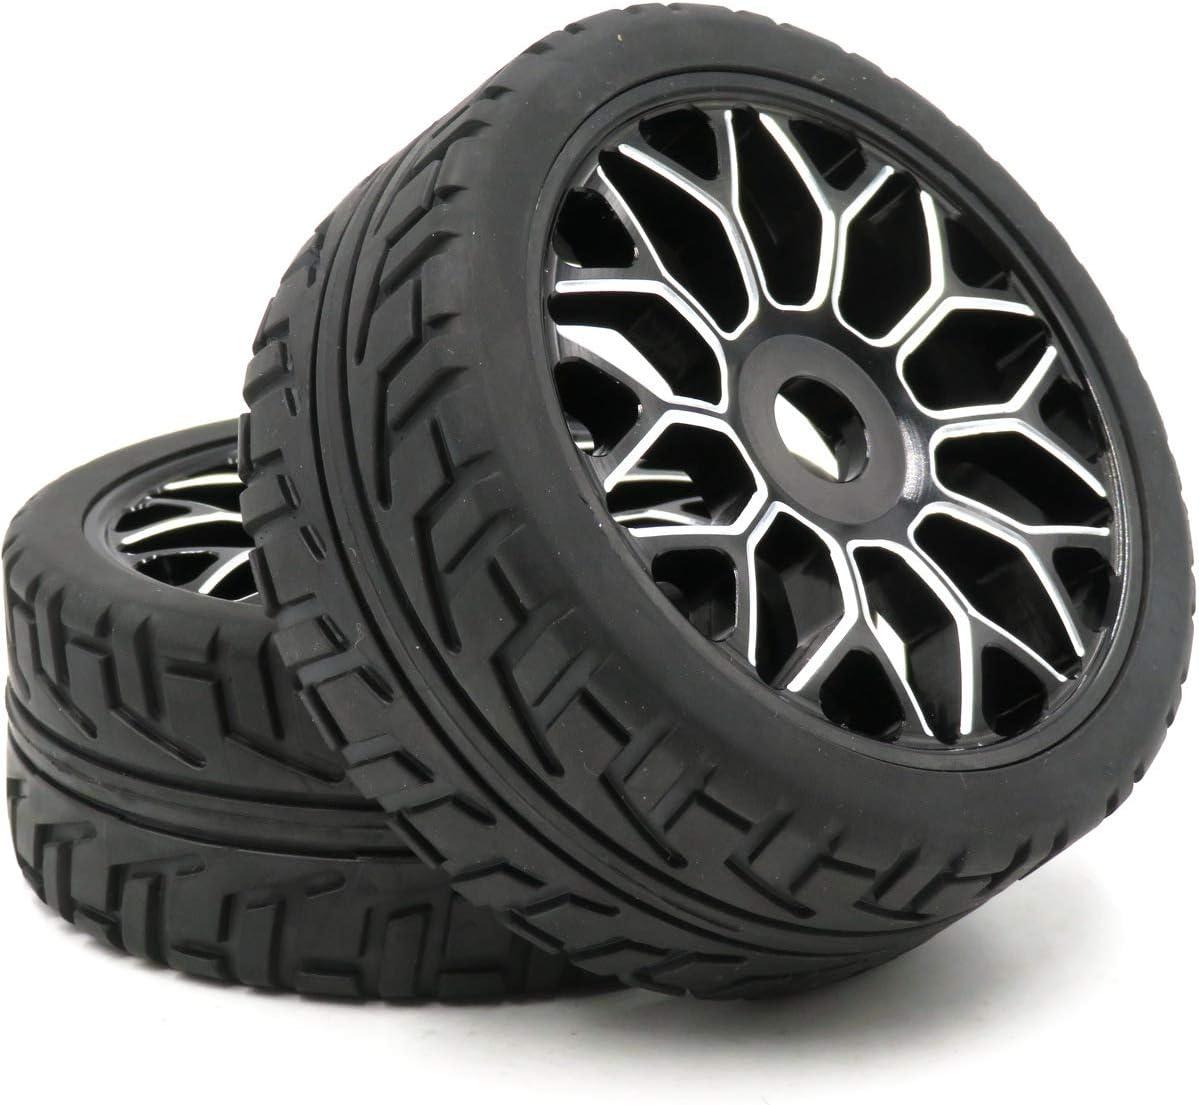 Hobbysoul 4 Stück Rc 1 8 Aluminium Felgen Wheel Rim Sechskant 17mm 1 8 Buggy On Road Reifen Tire Spielzeug